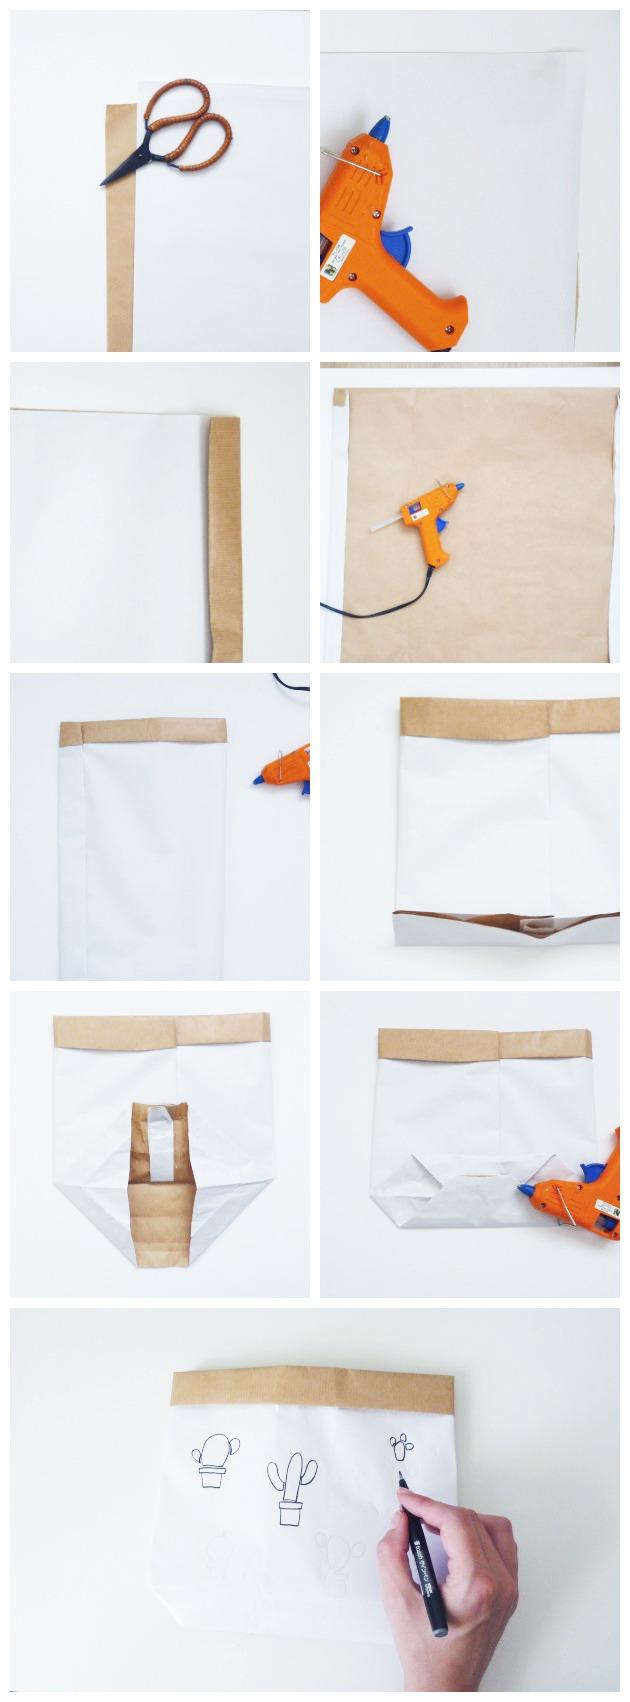 tuto diy sac en papier